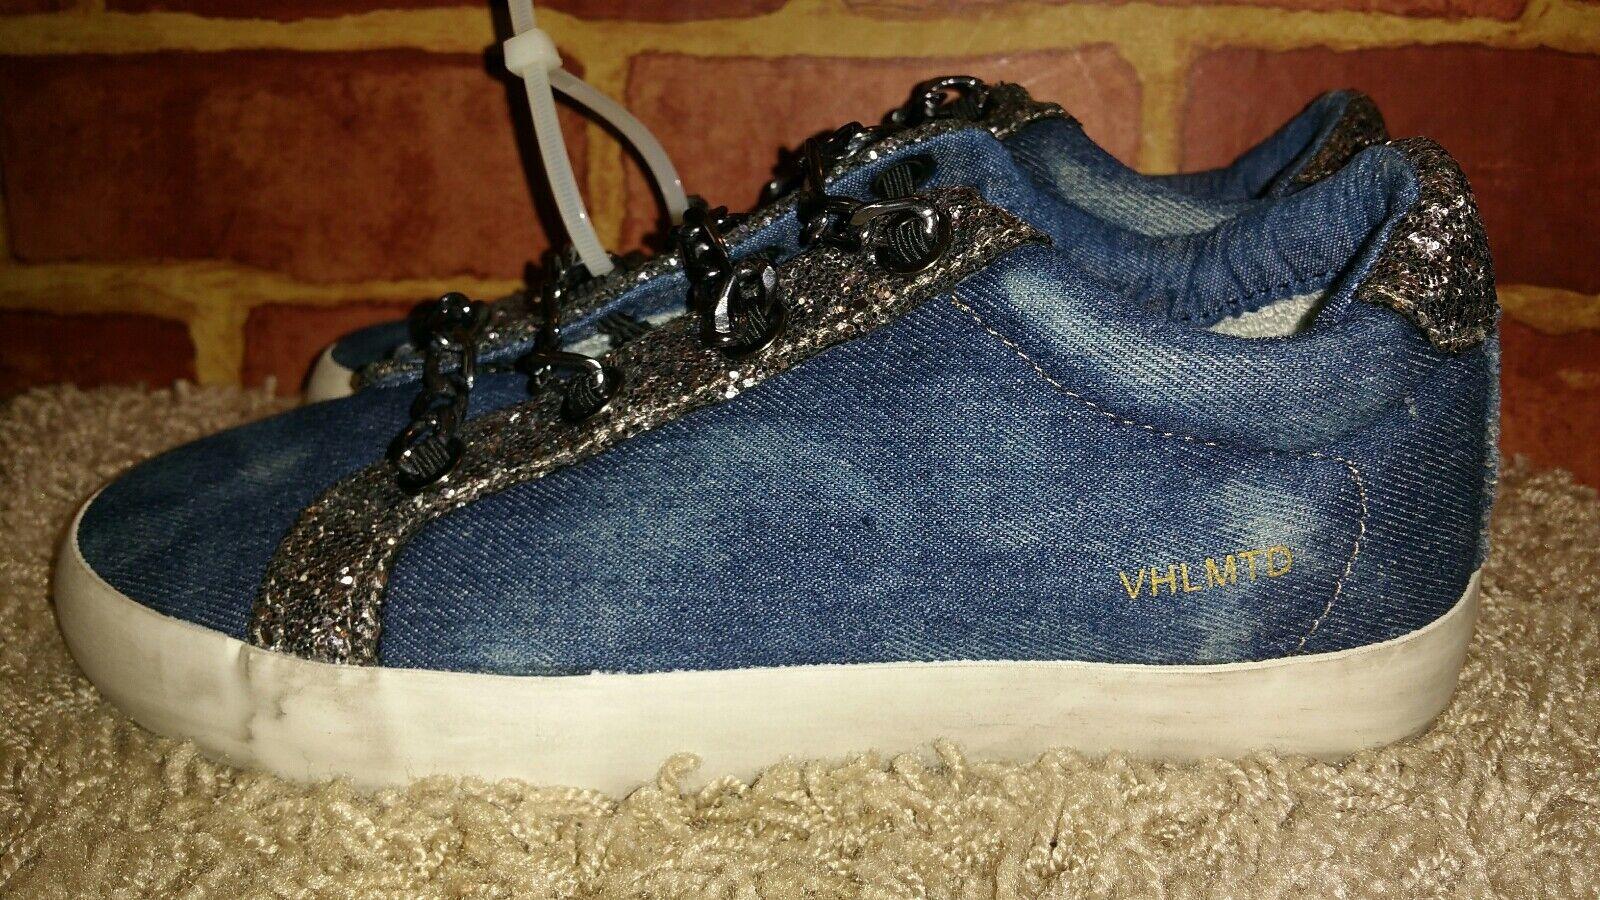 Vintage Havana WM's Yves Sneakers, Sneakers, Sneakers, bluee Denim Sparkle Slip on, Chain SZ 11 2462 b6a99a